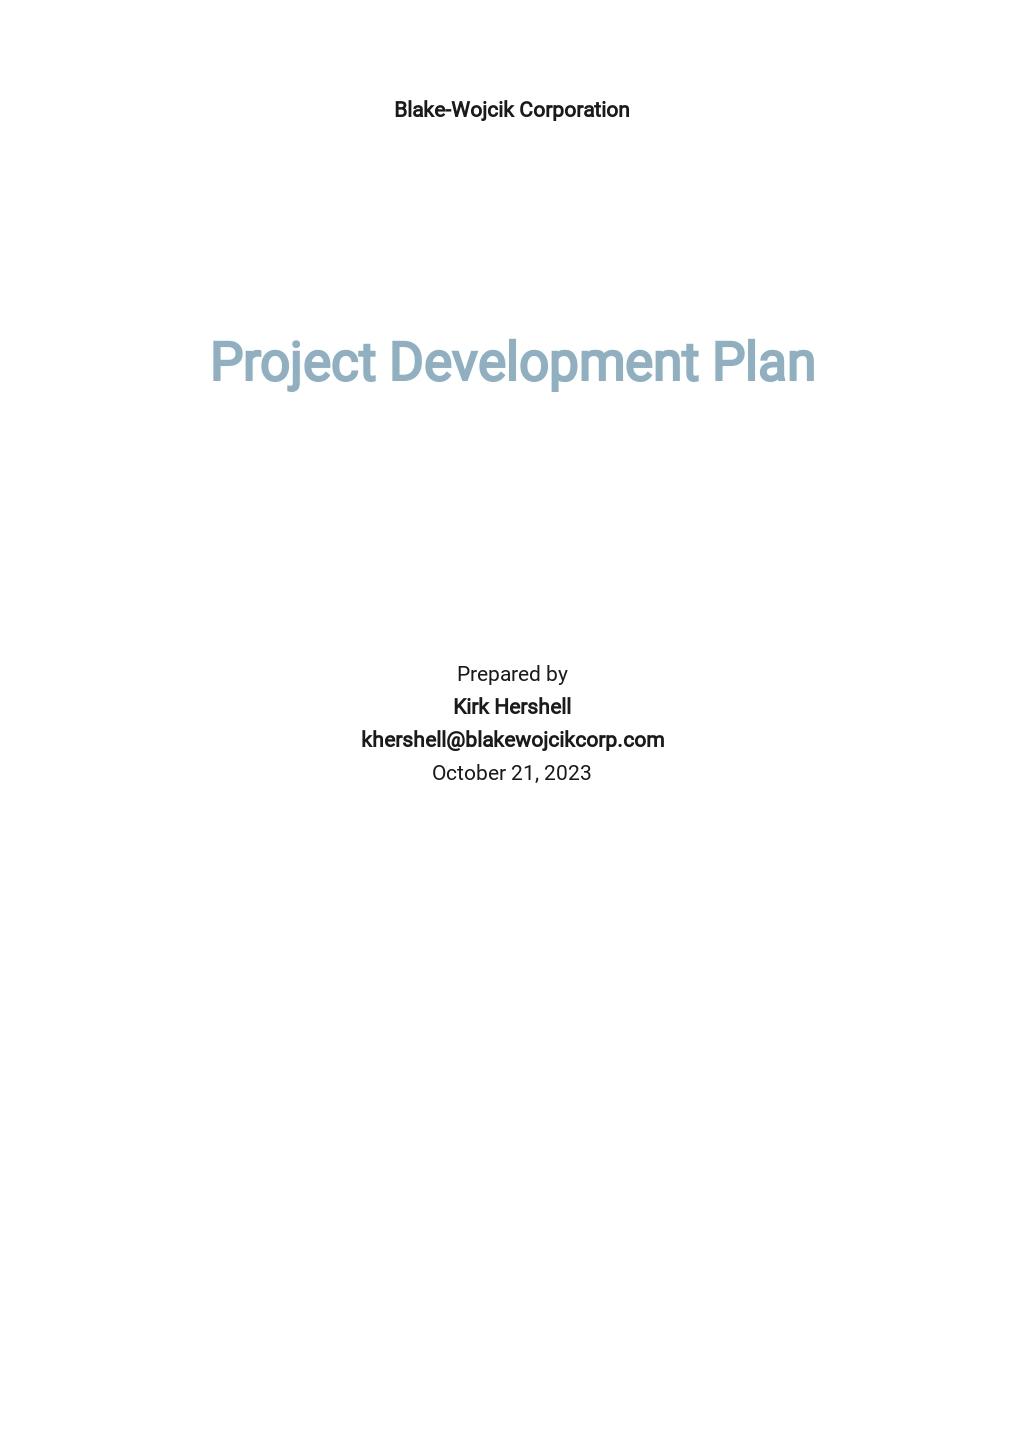 Project Development Plan Template